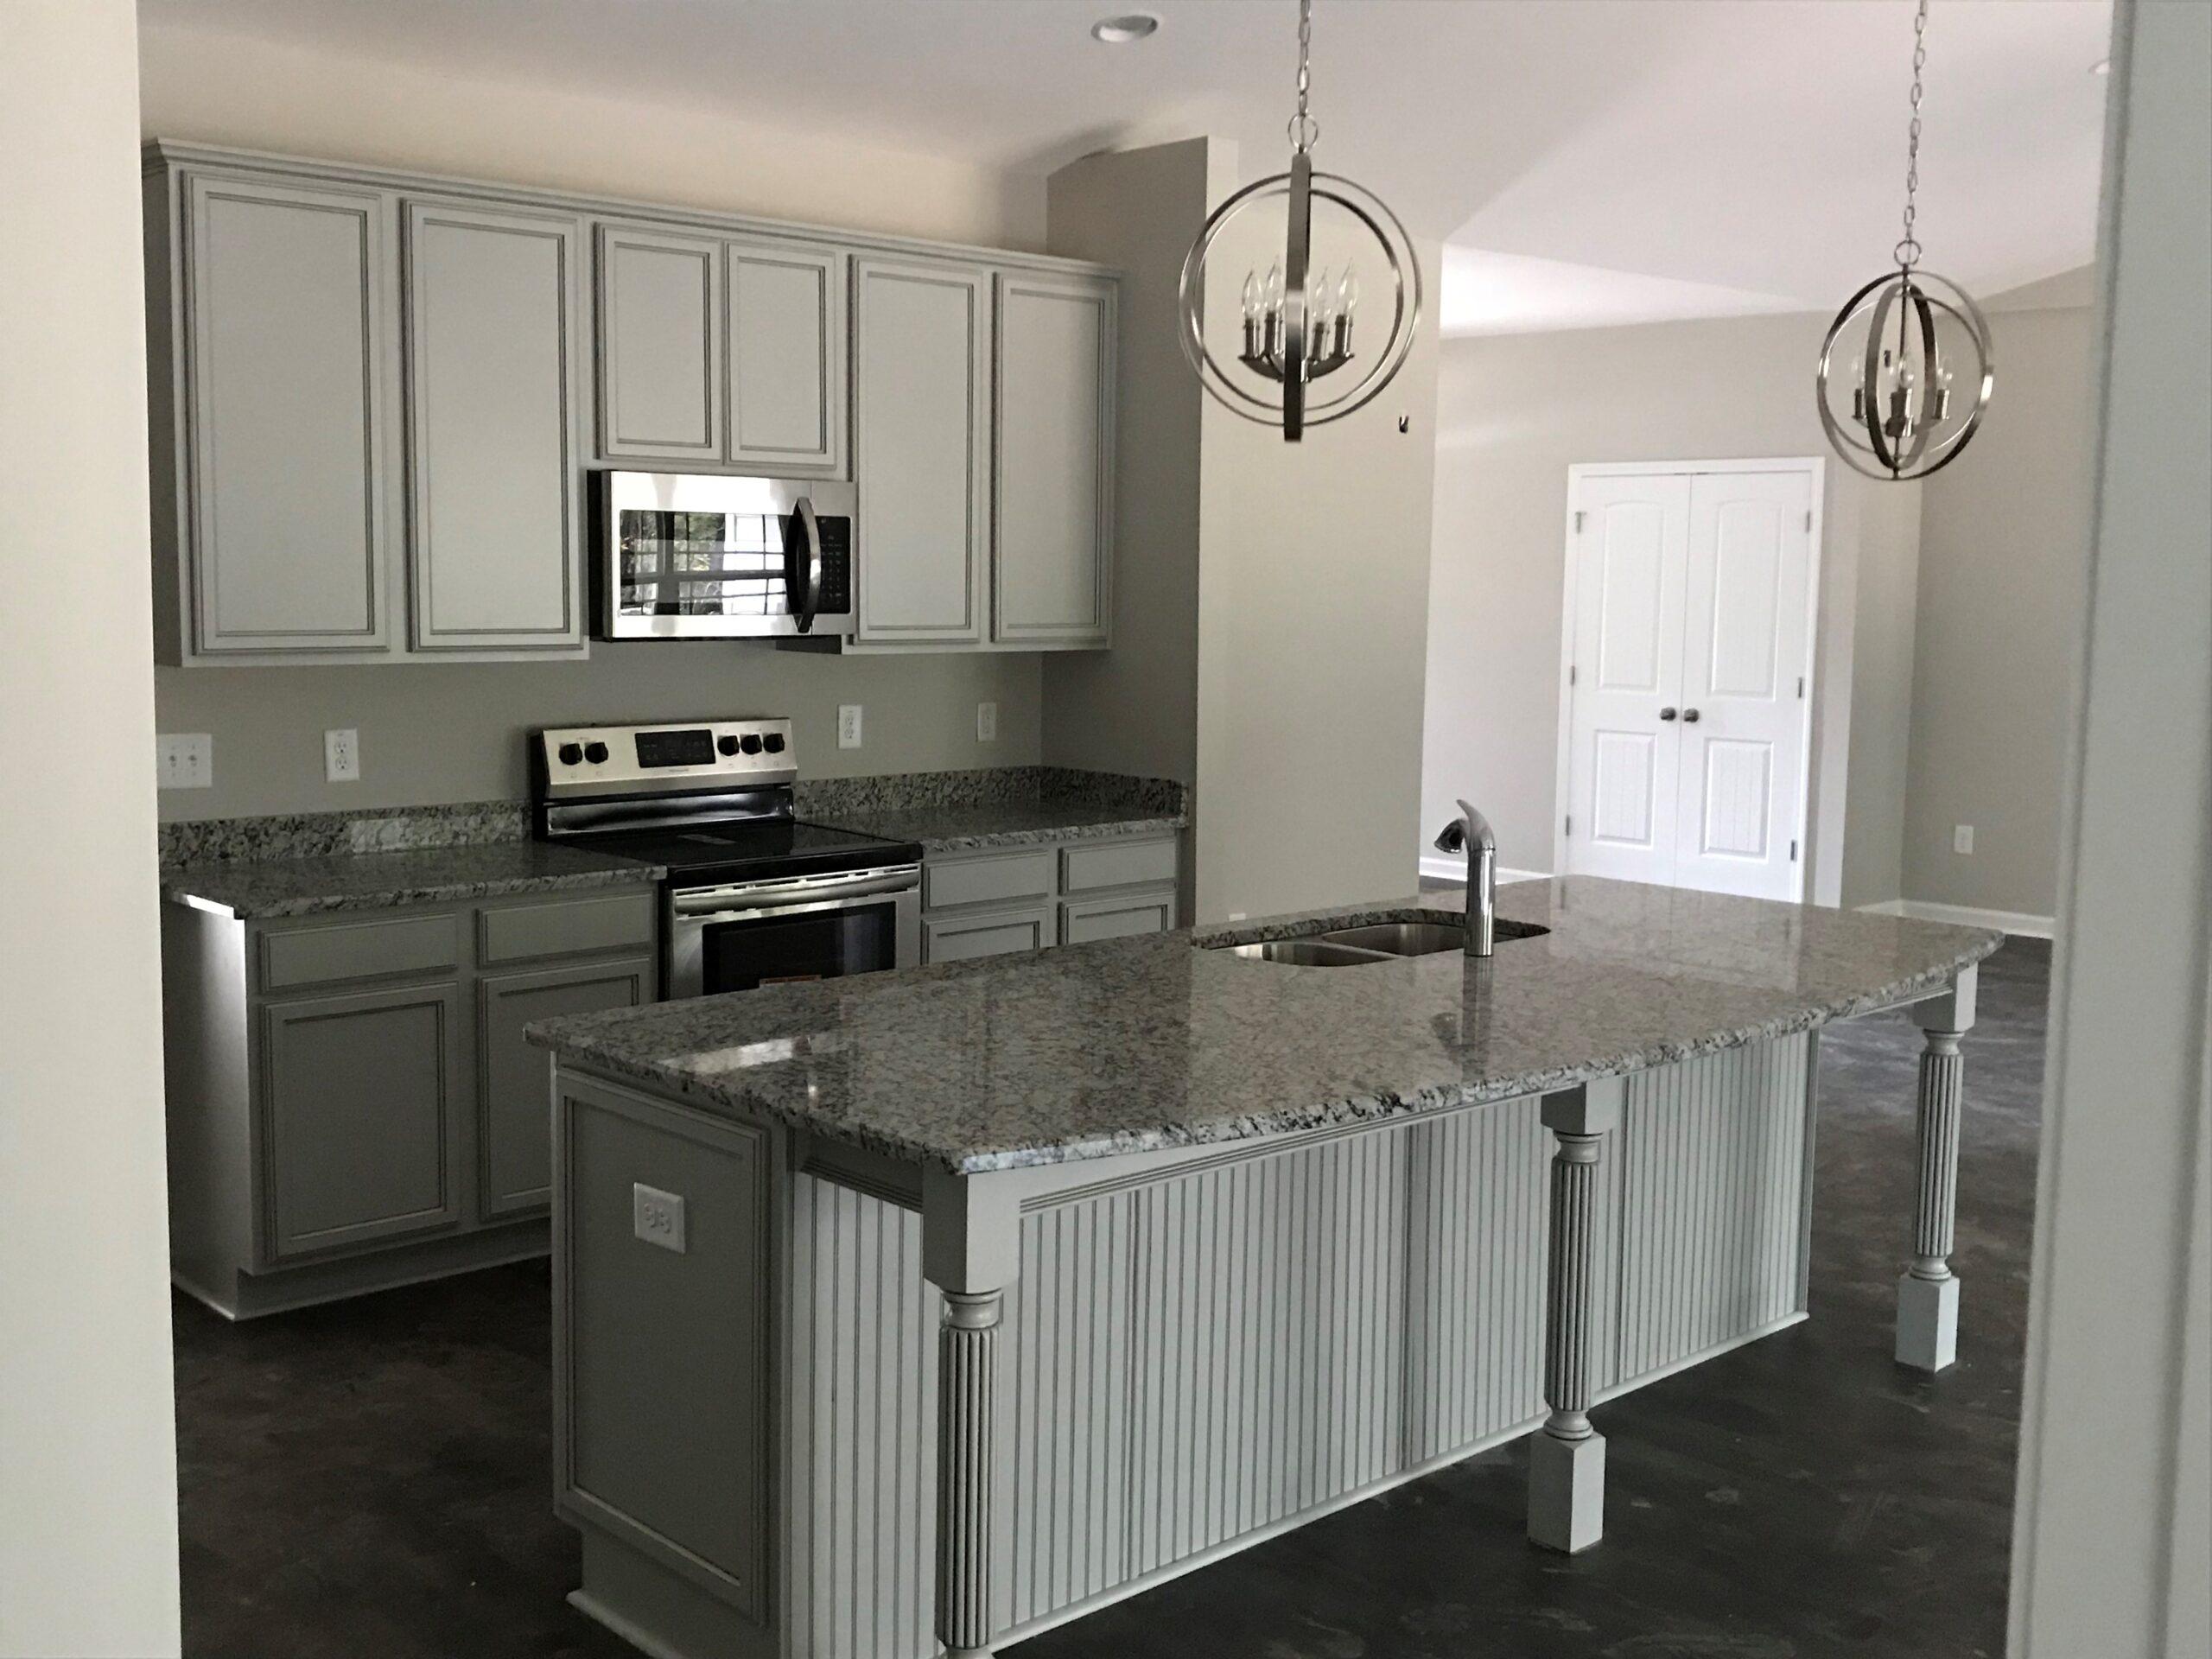 Kitchen Cabinets Raleigh Transitional Cambridge Greystone Grey Paint Island Beadboard Legs Granite